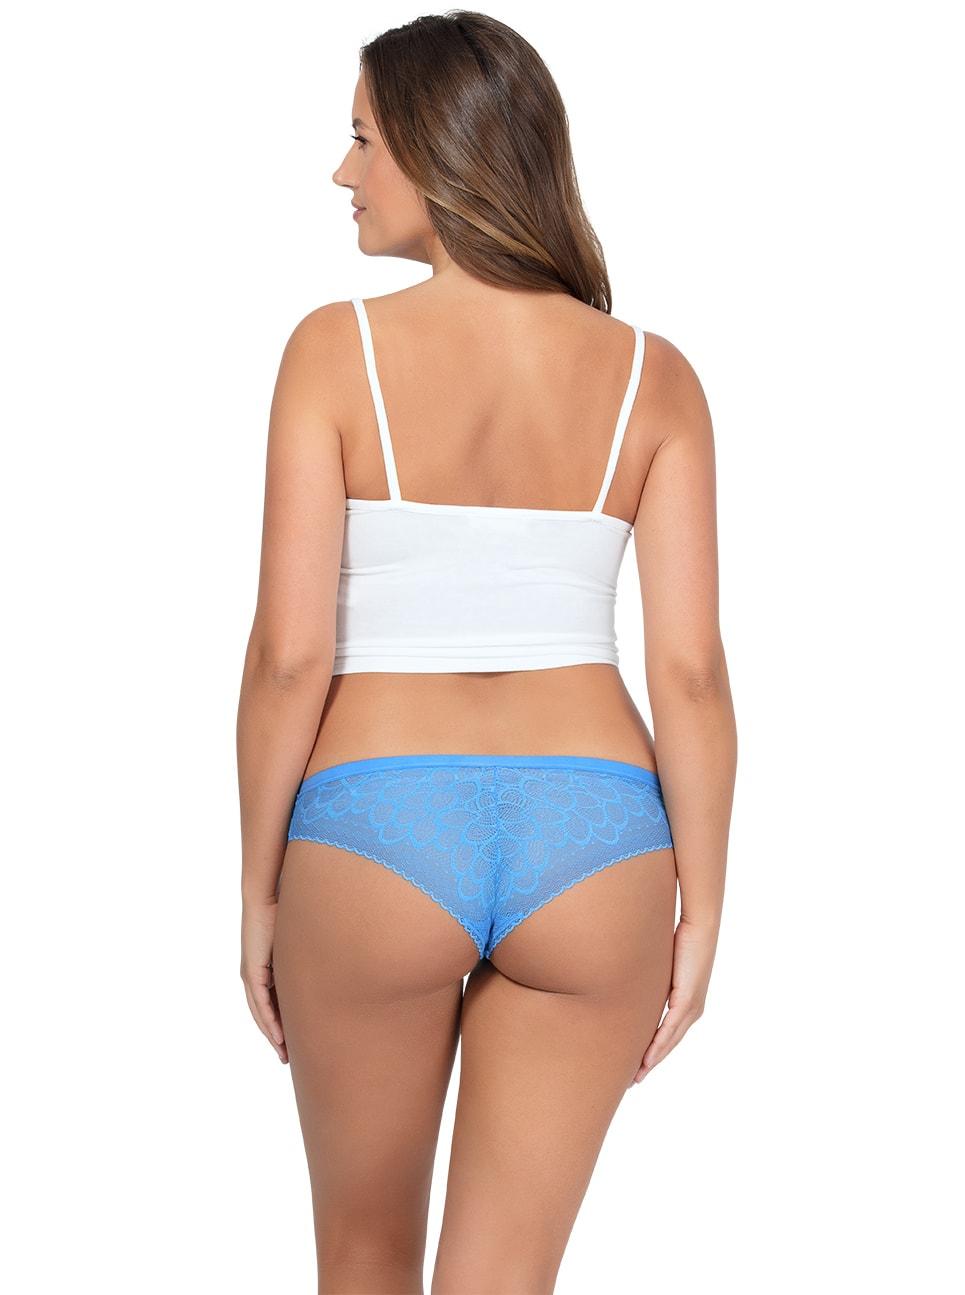 ParfaitPanty SoGlam BIKINIPP302 MediterraneanBlue BACK copy 1 - Panty So Glam Bikini - Mediterranean Blue - PP302